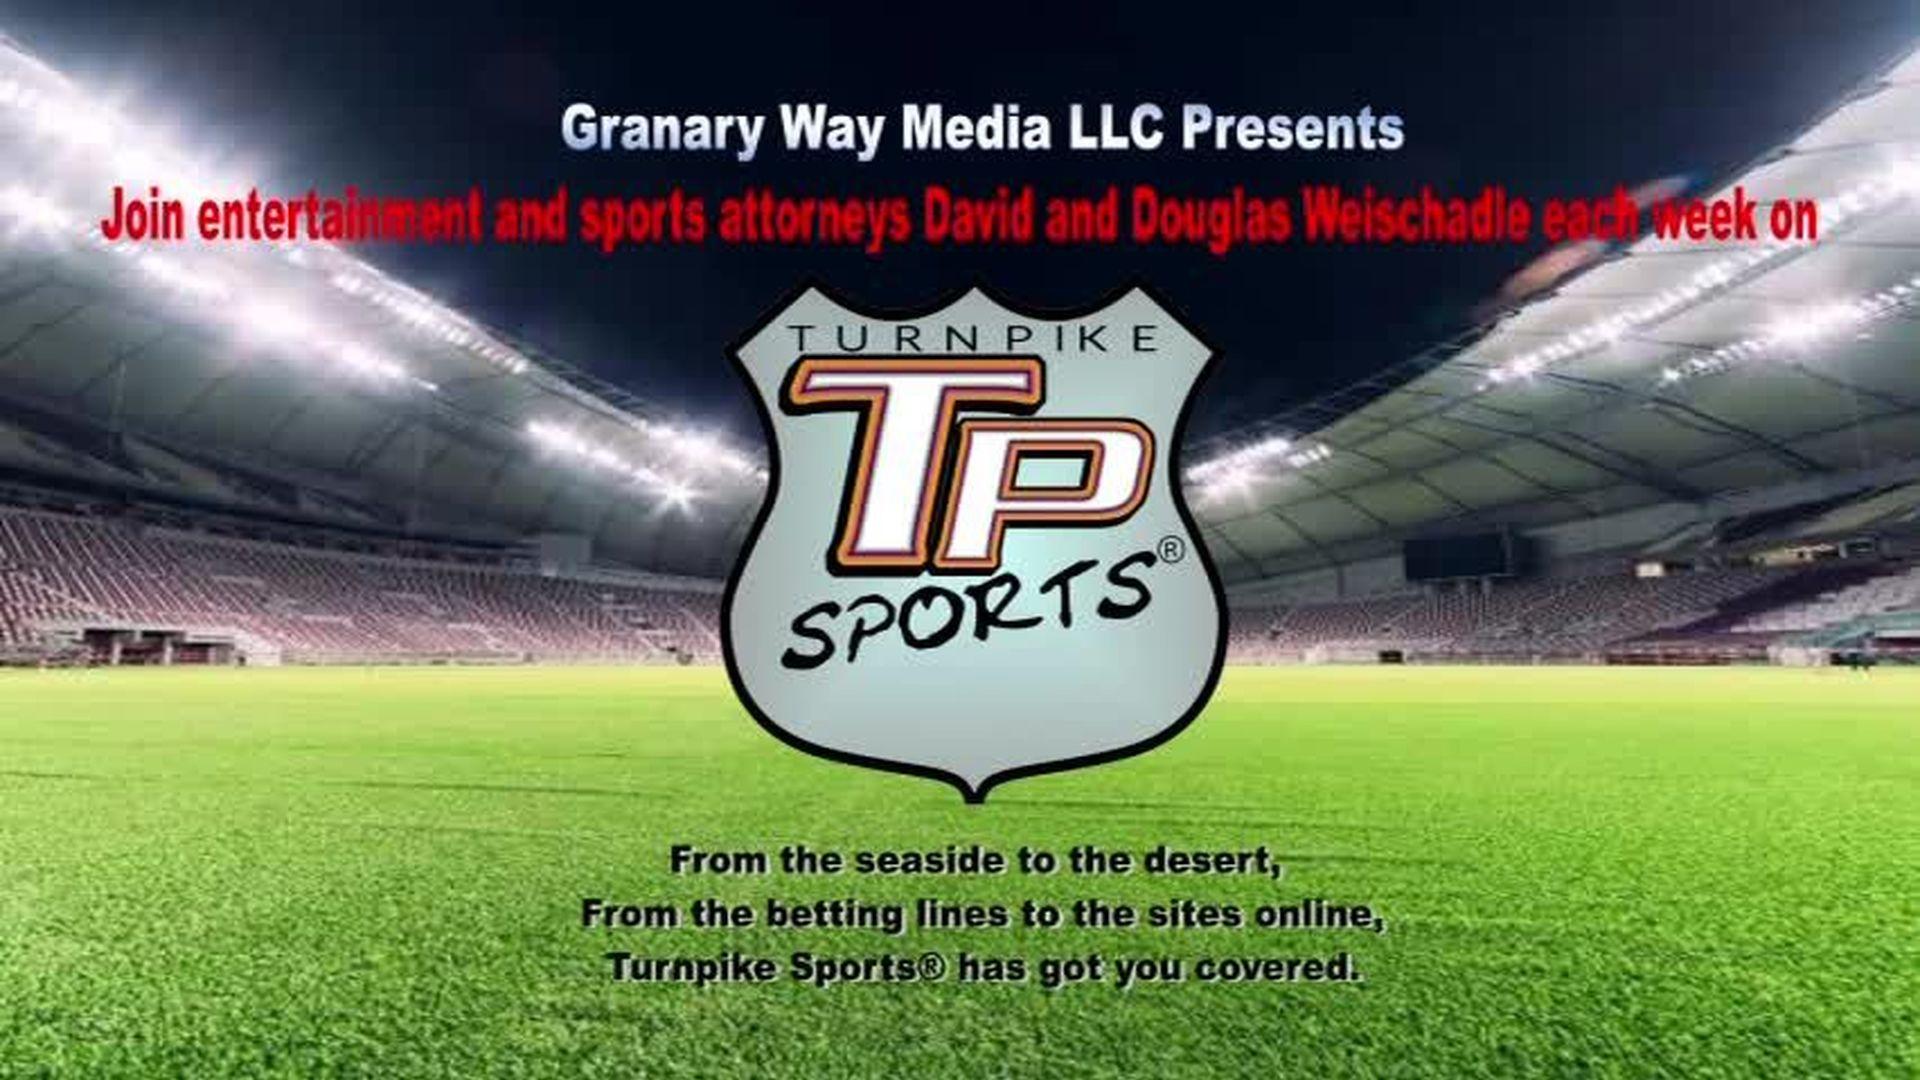 Turnpike Sports® - S 3 - Ep 19